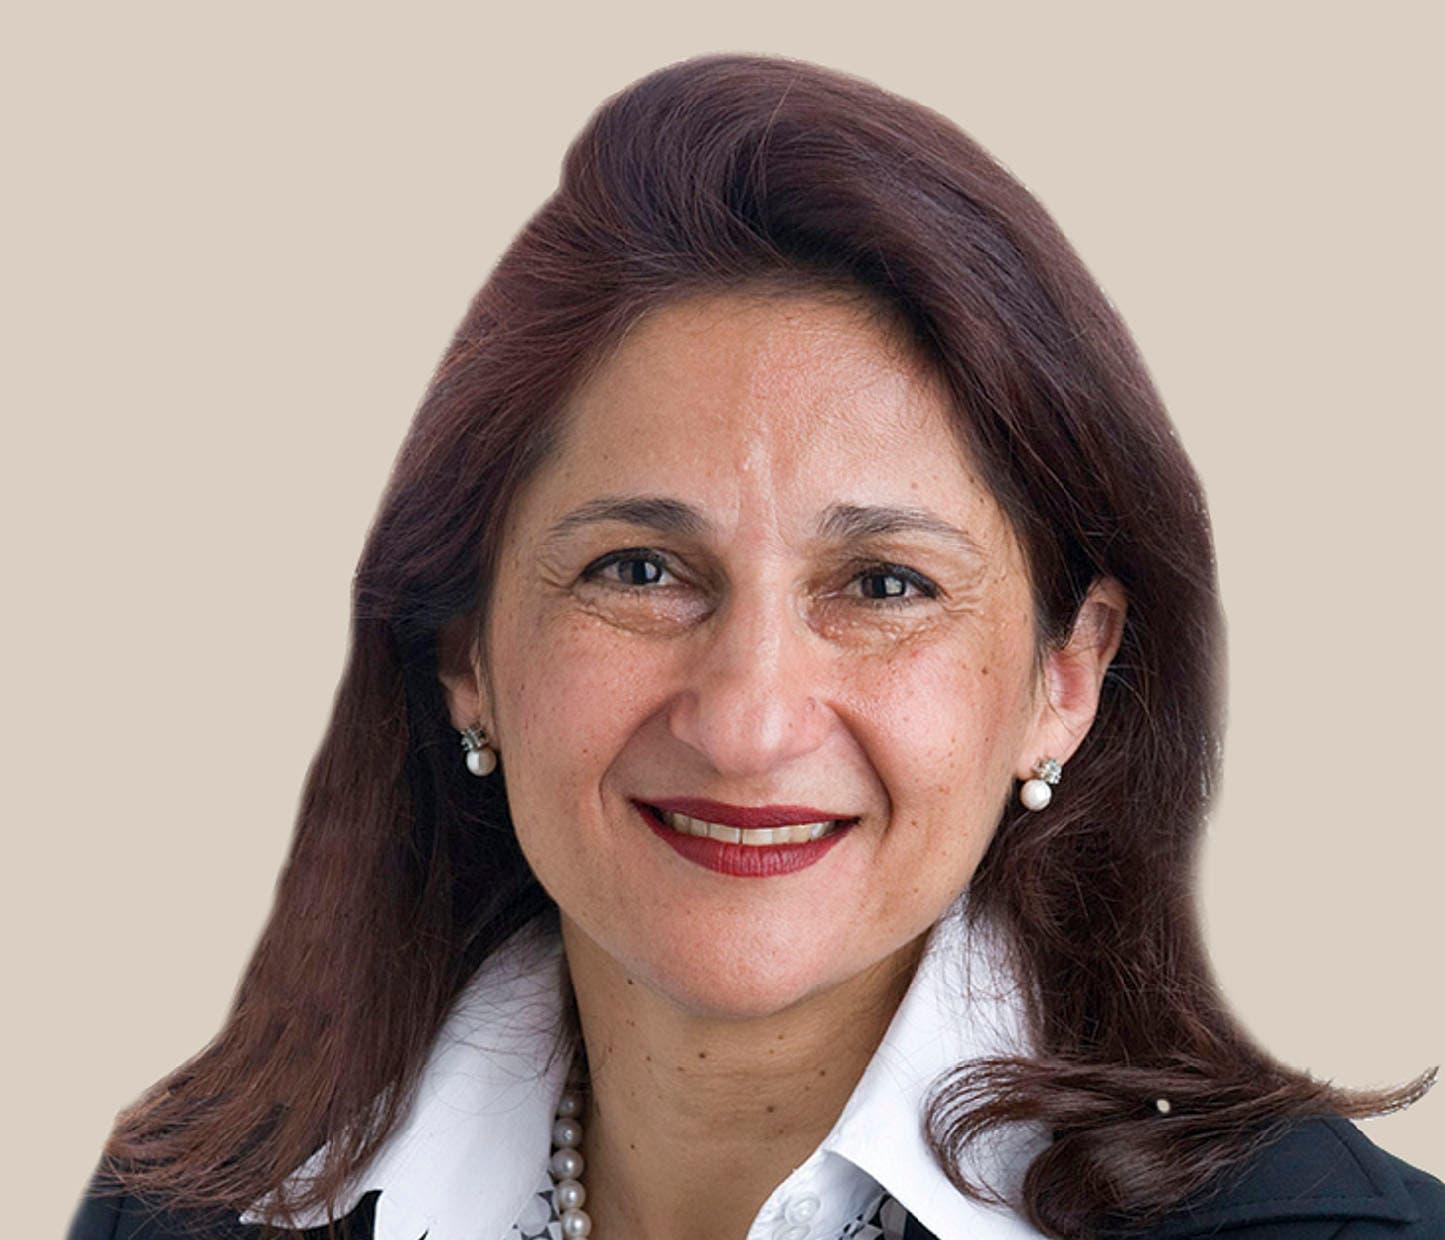 Deputy governor of the Bank of England, Dr. Nemat Talaat Shafik